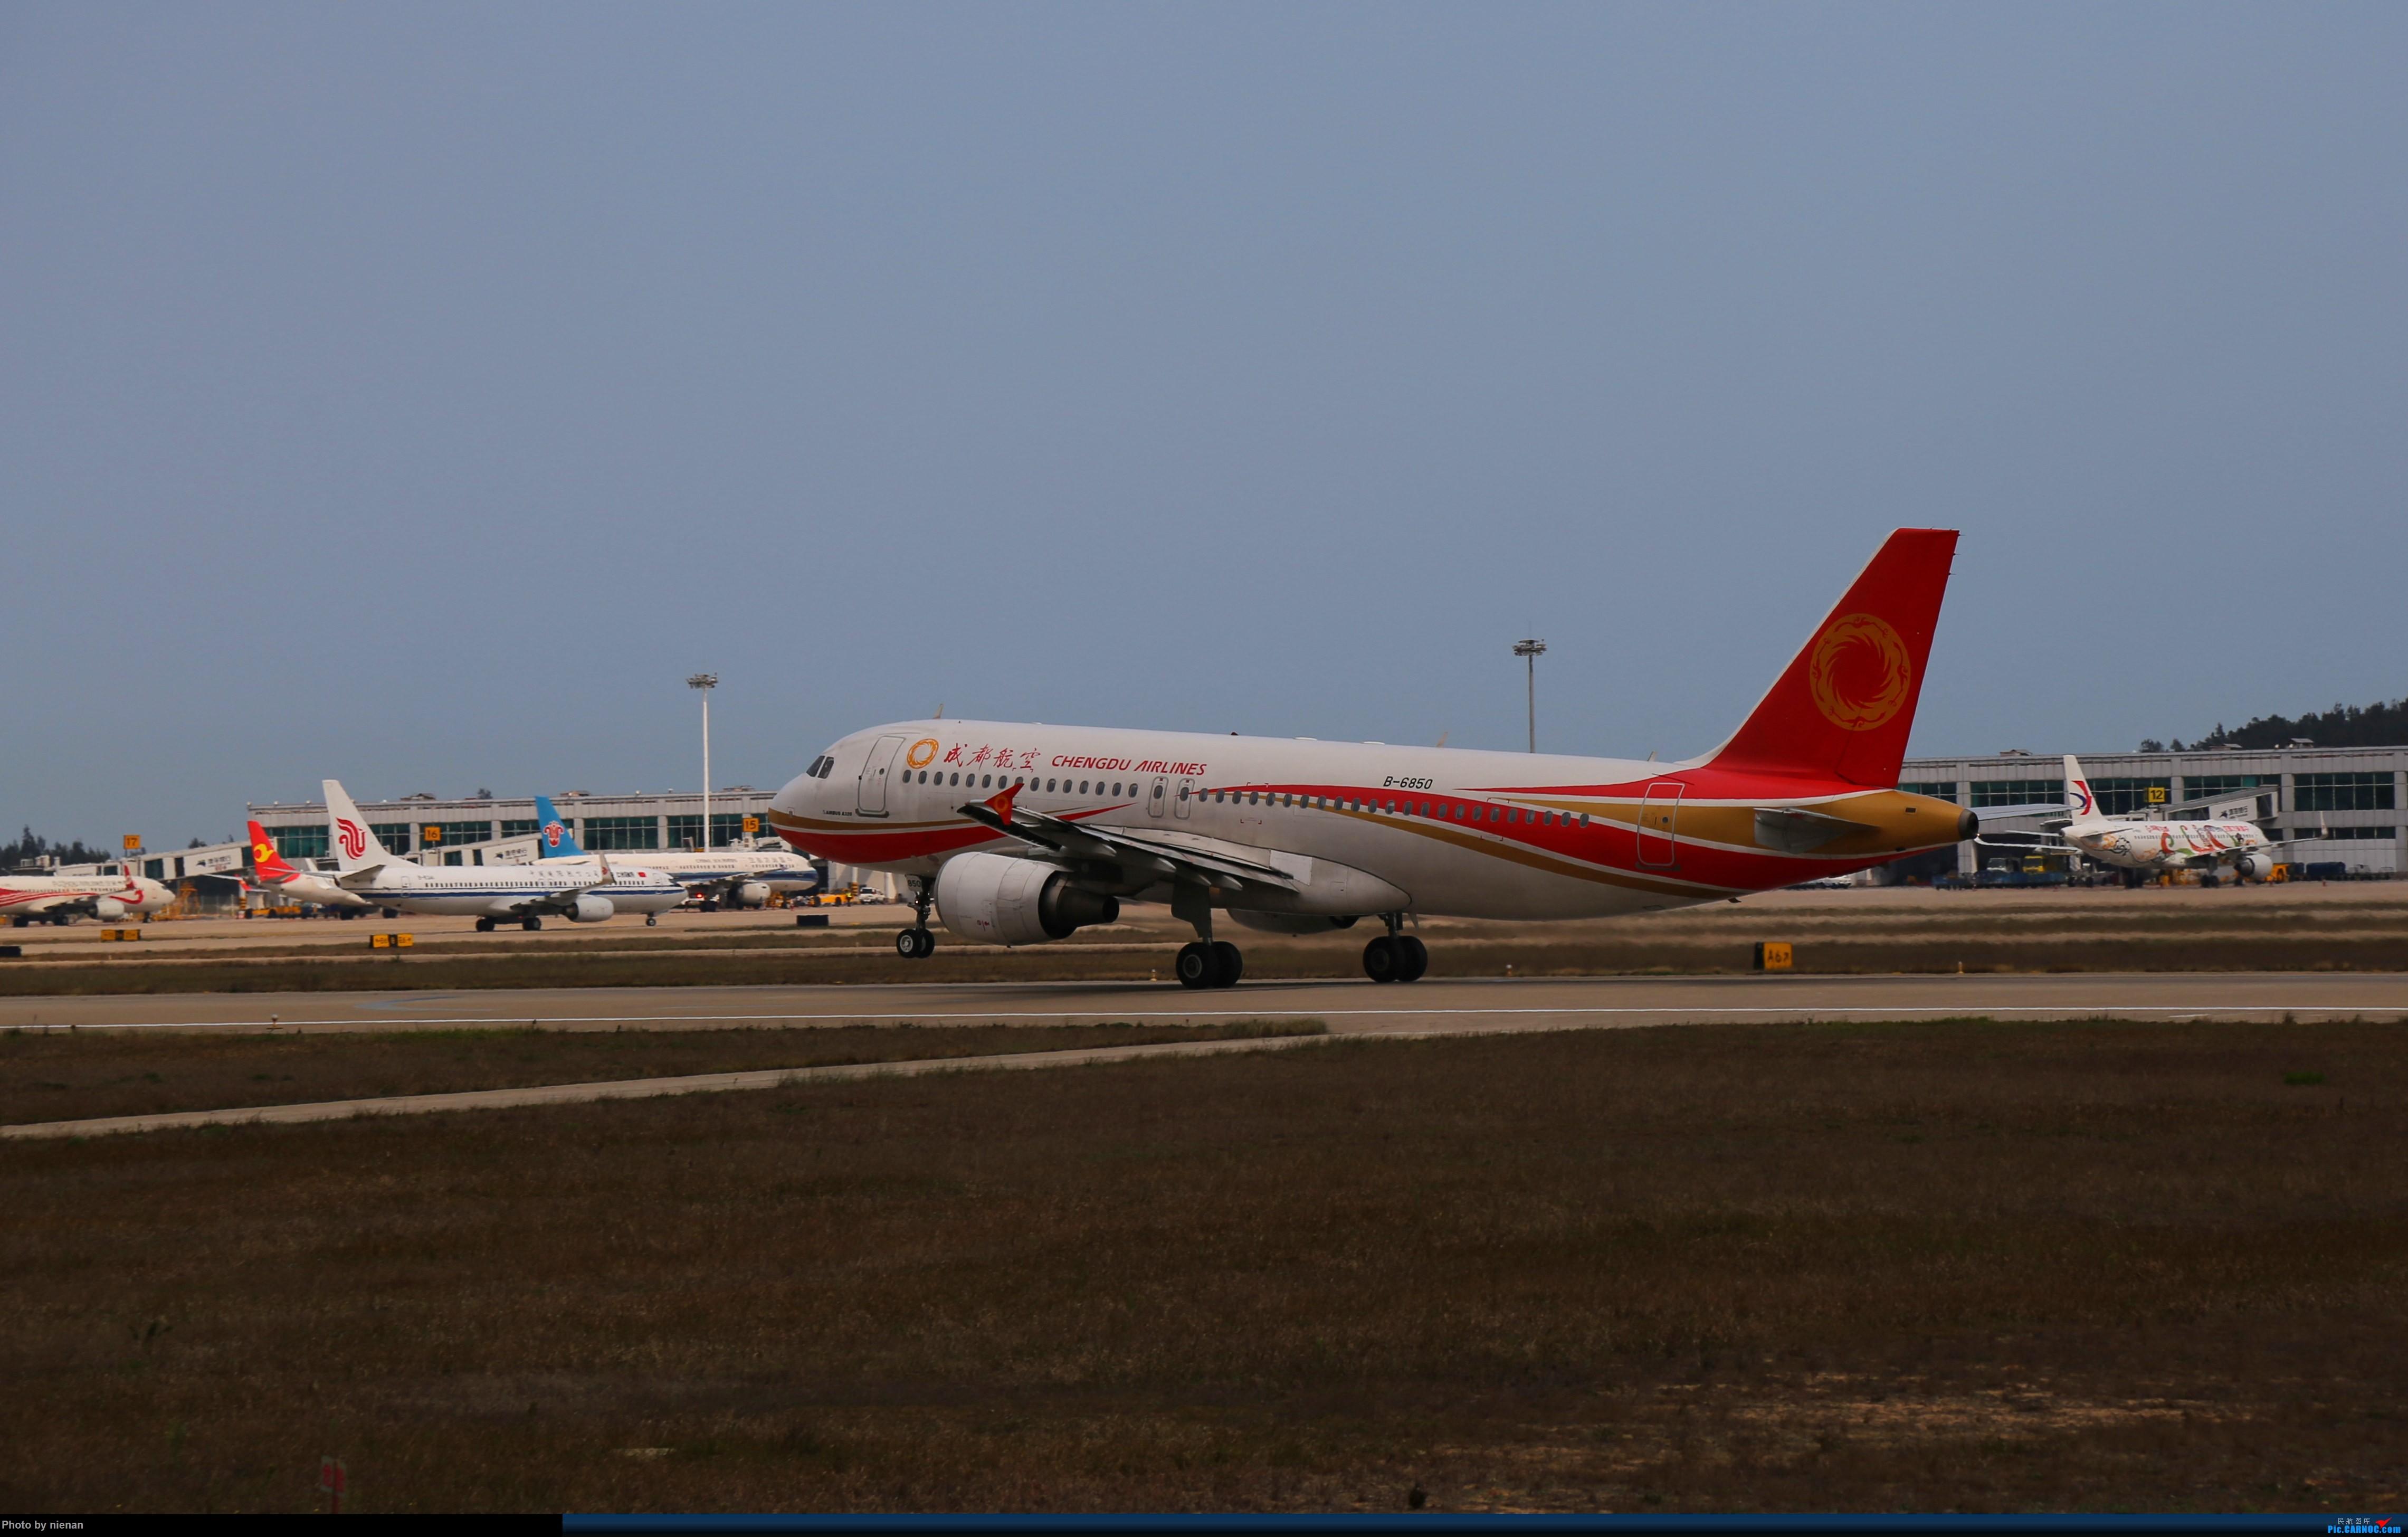 Re:[原创]好久不见 发点冷饭贴 AIRBUS A320-200 B-6850 中国福州长乐国际机场